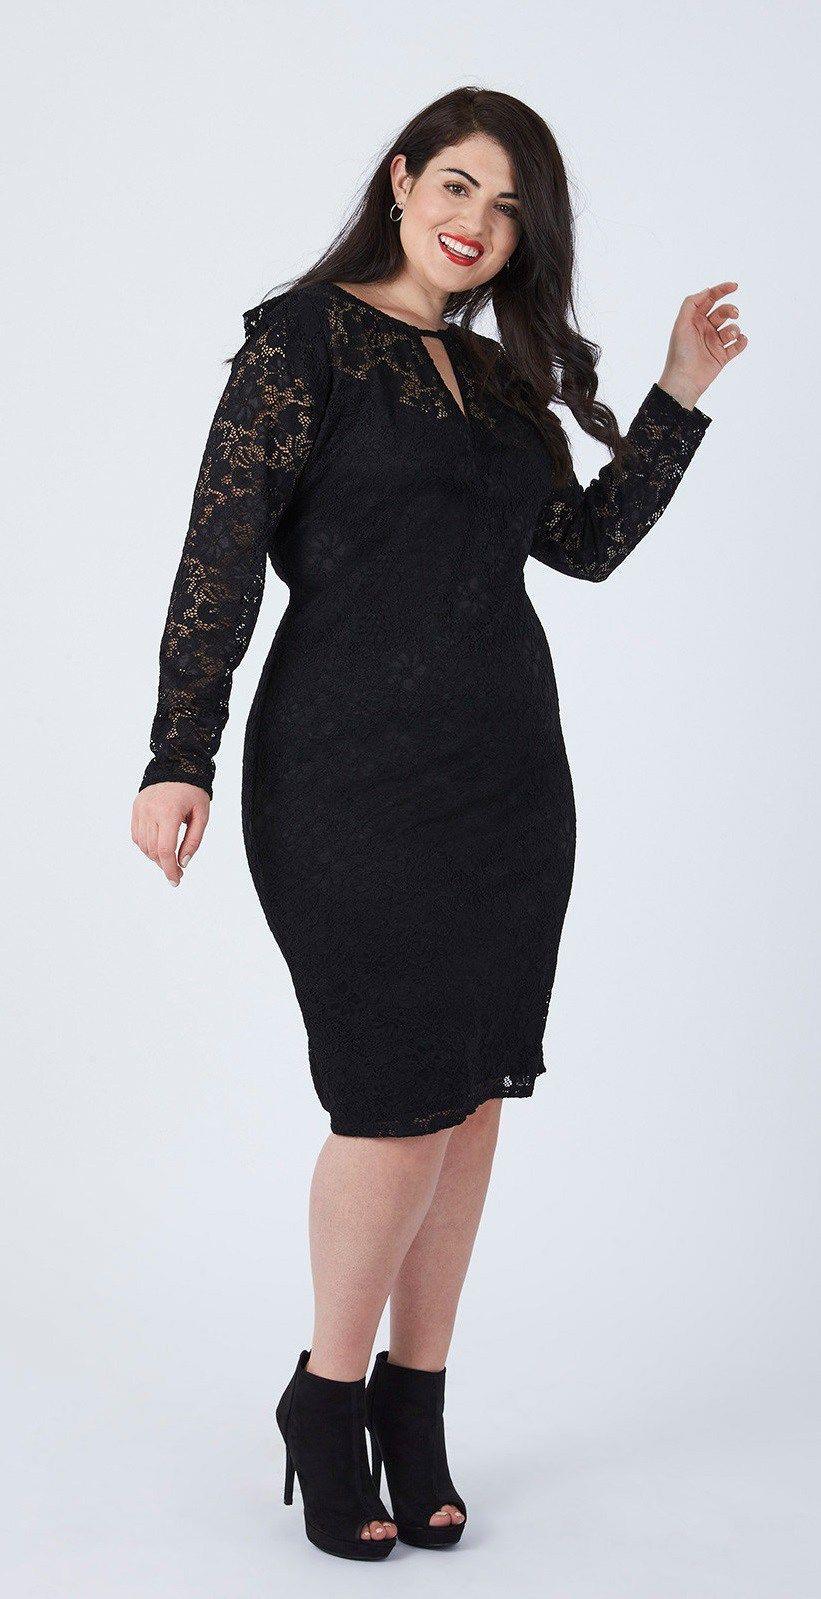 47a783cd36a Plus Size LBD Outfits - Plus Size Little Black Dress - Plus Size Holiday  Dress  plussize  alexawebb  dress  holiday